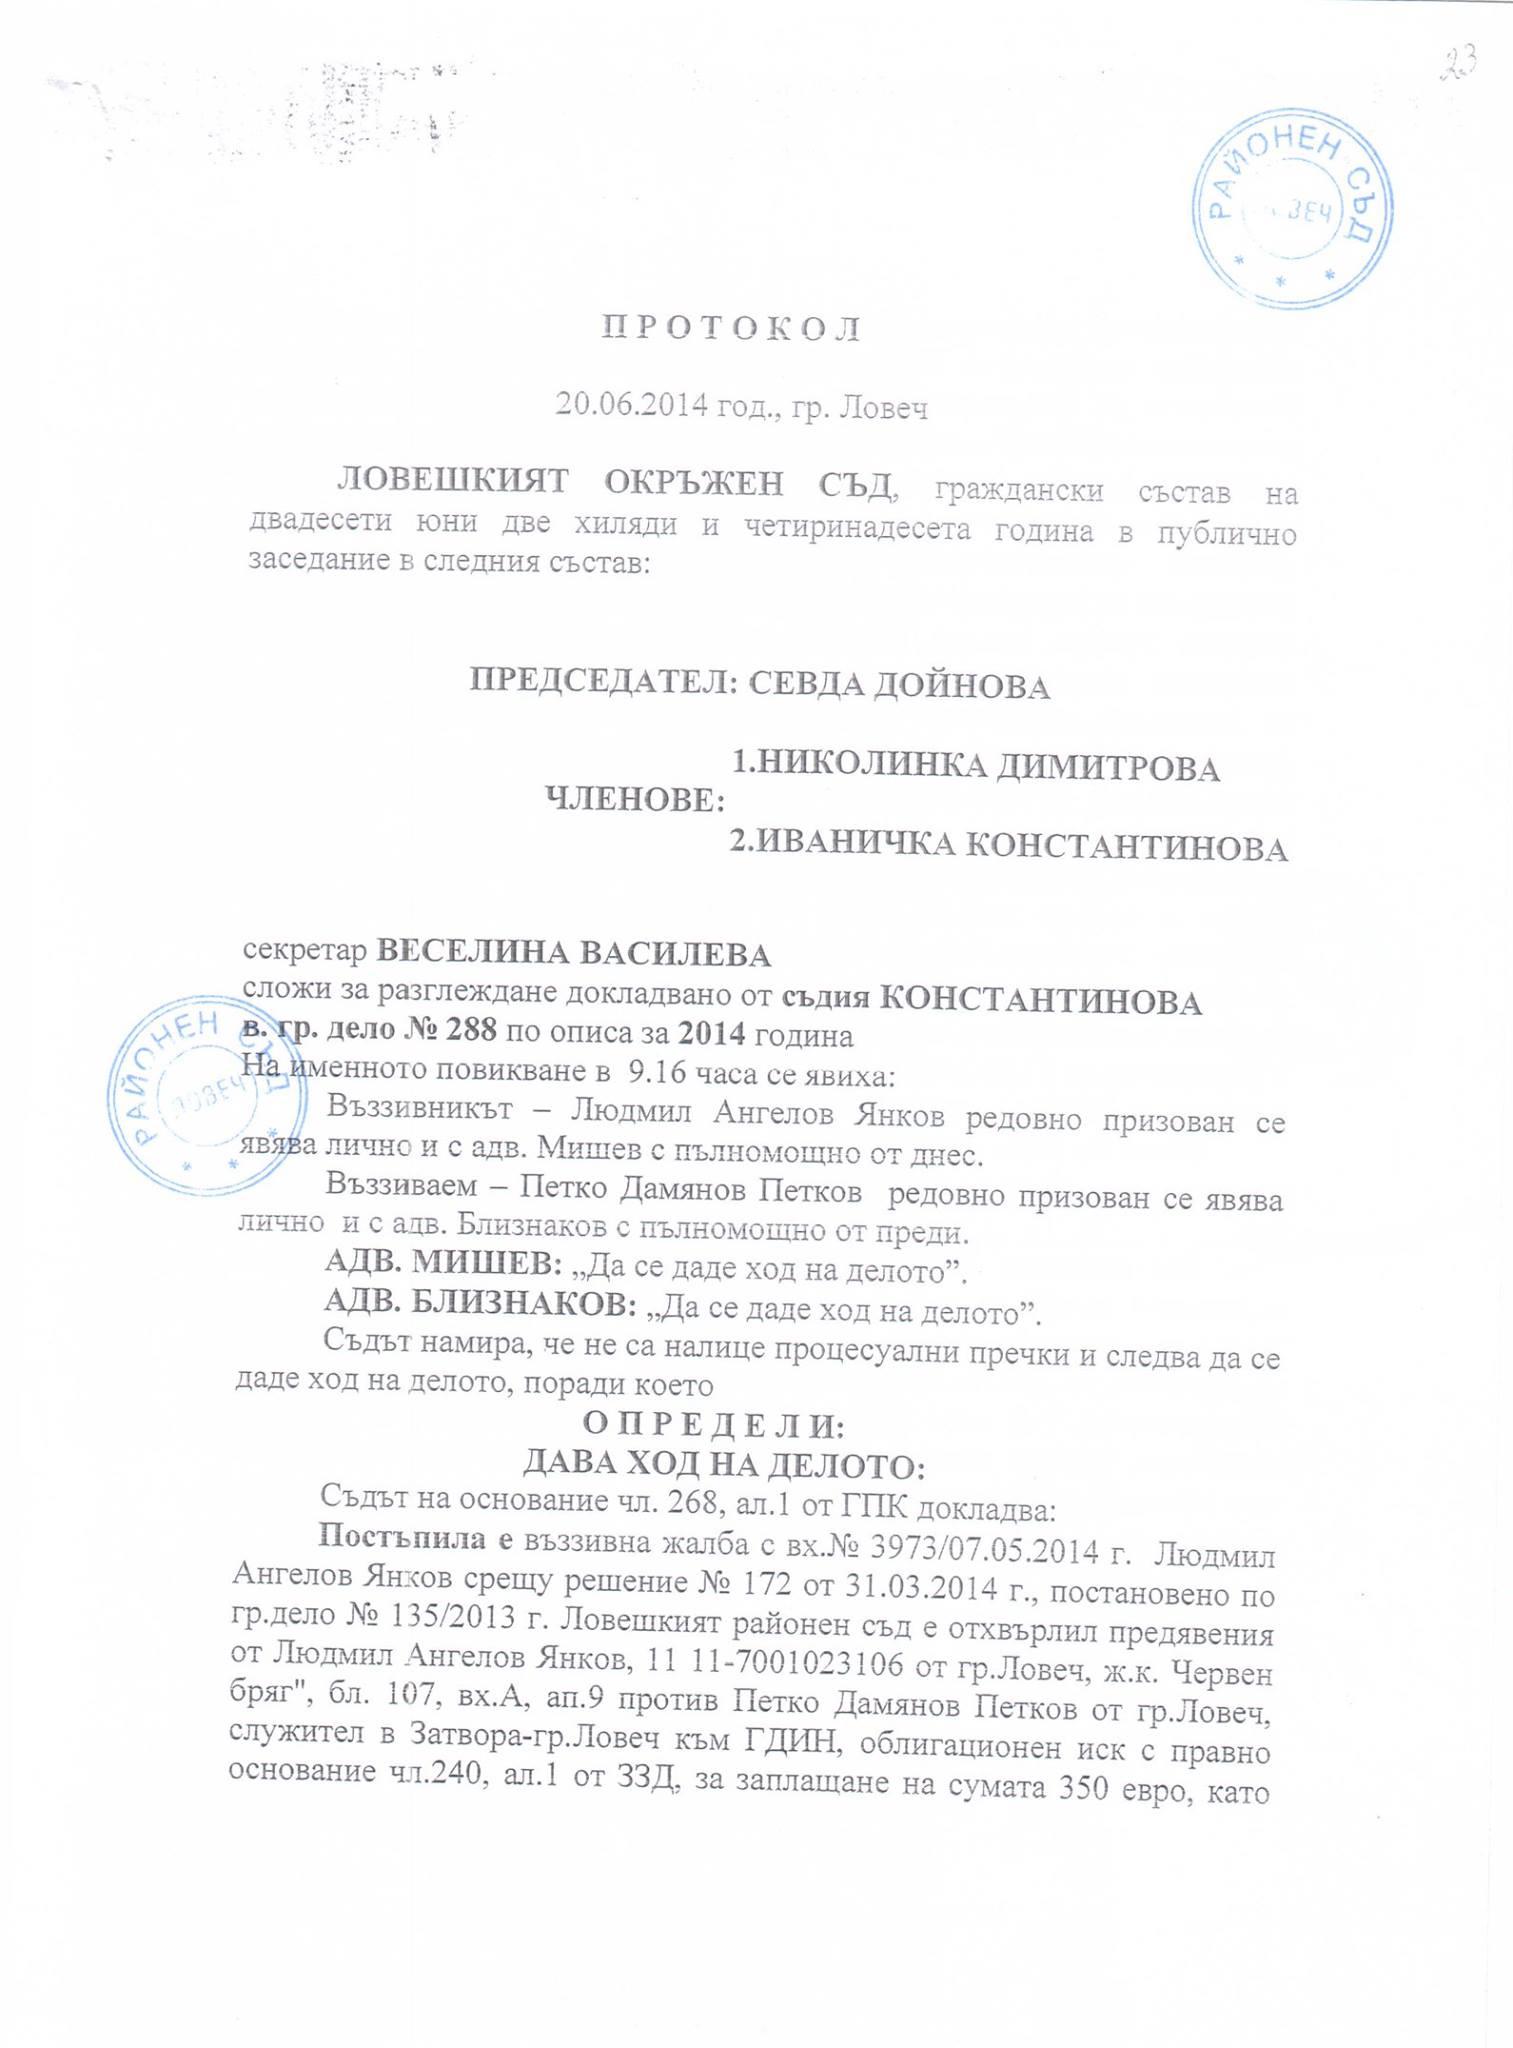 protokol-petkov-1